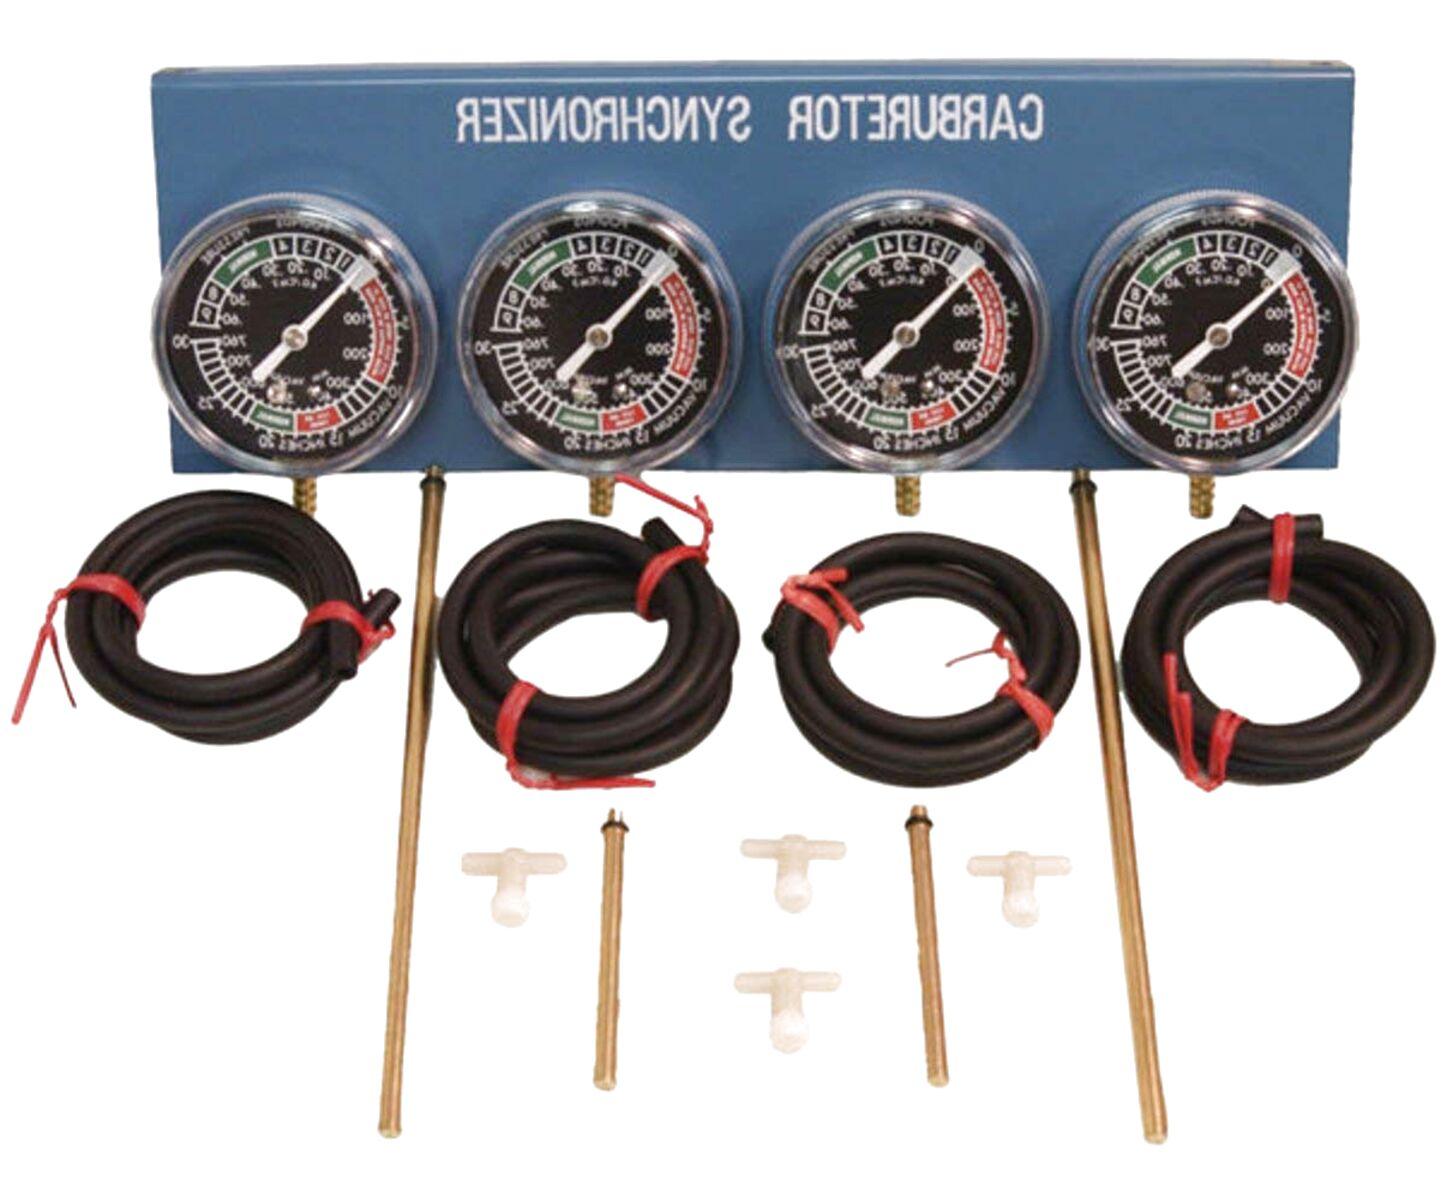 Moligh doll Automotive Motorcycles Petrol Engine Compression Test Gauge Tester Kit Tool Set